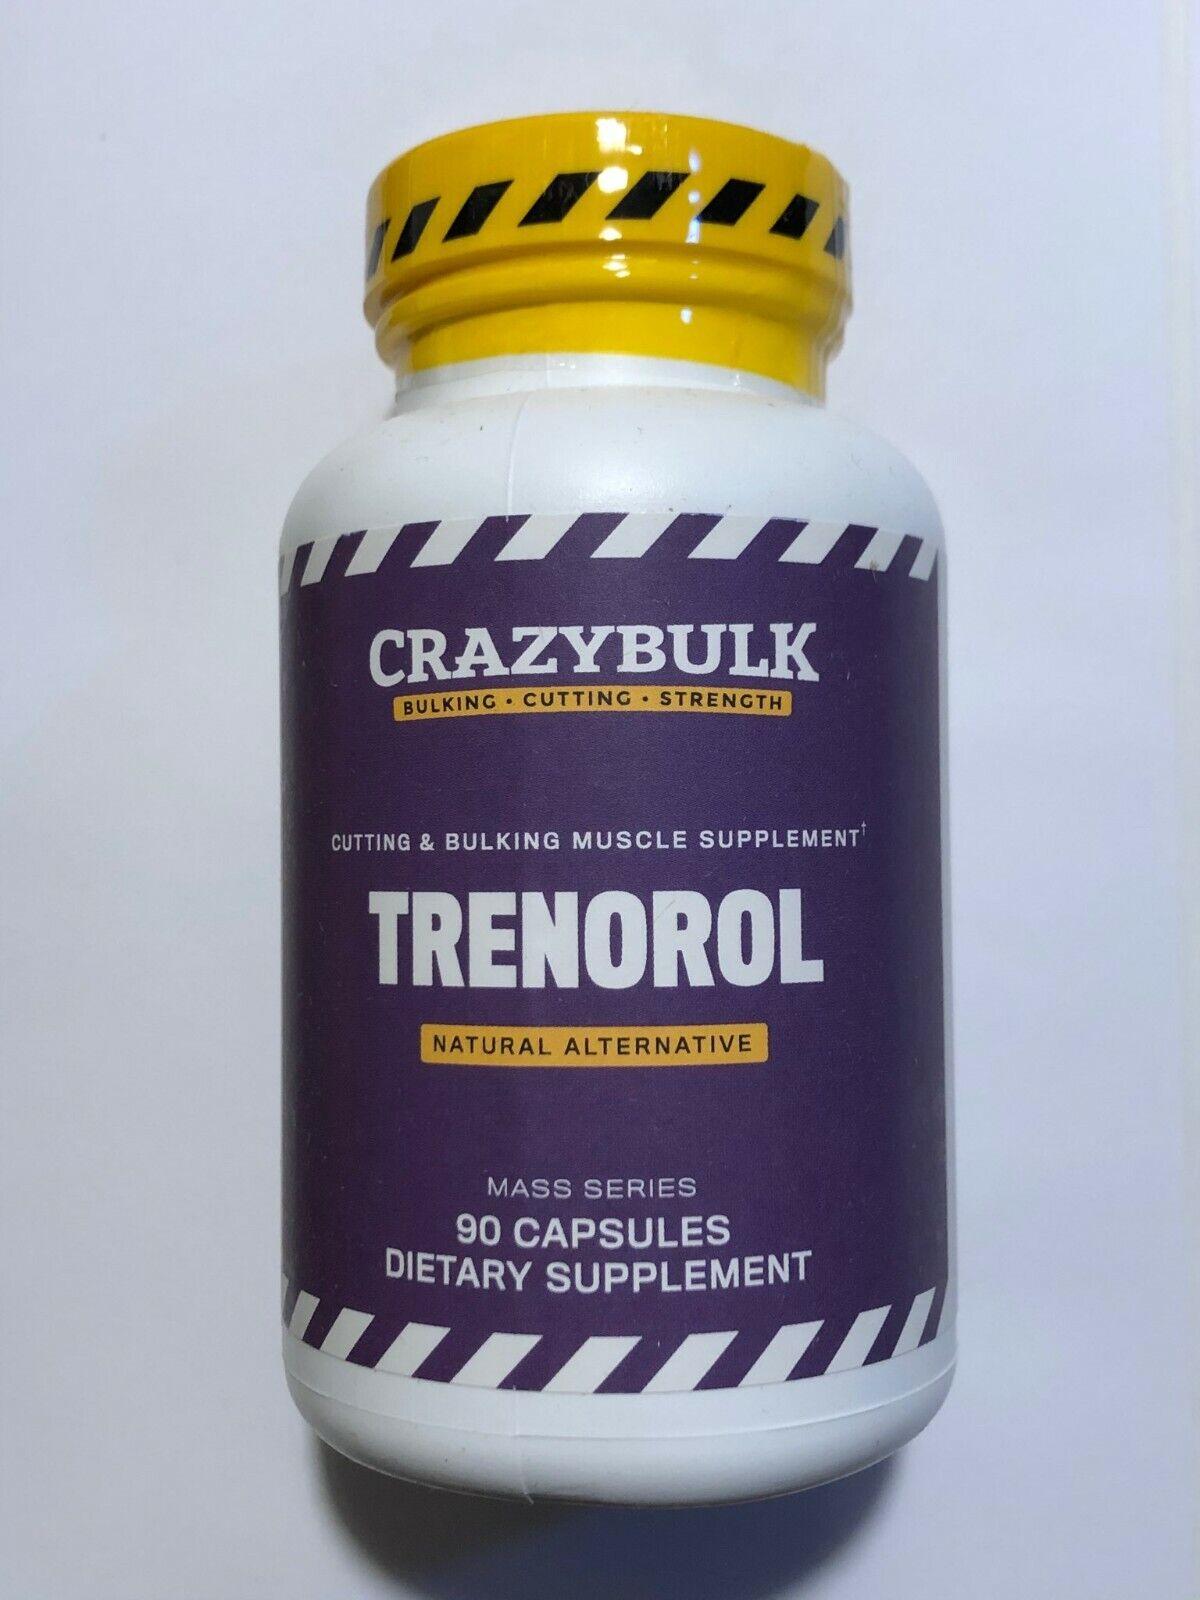 Crazy Bulk TRENOROL Cutting Muscle Strength Plant Stack Crazy Bulk Bulking Gains